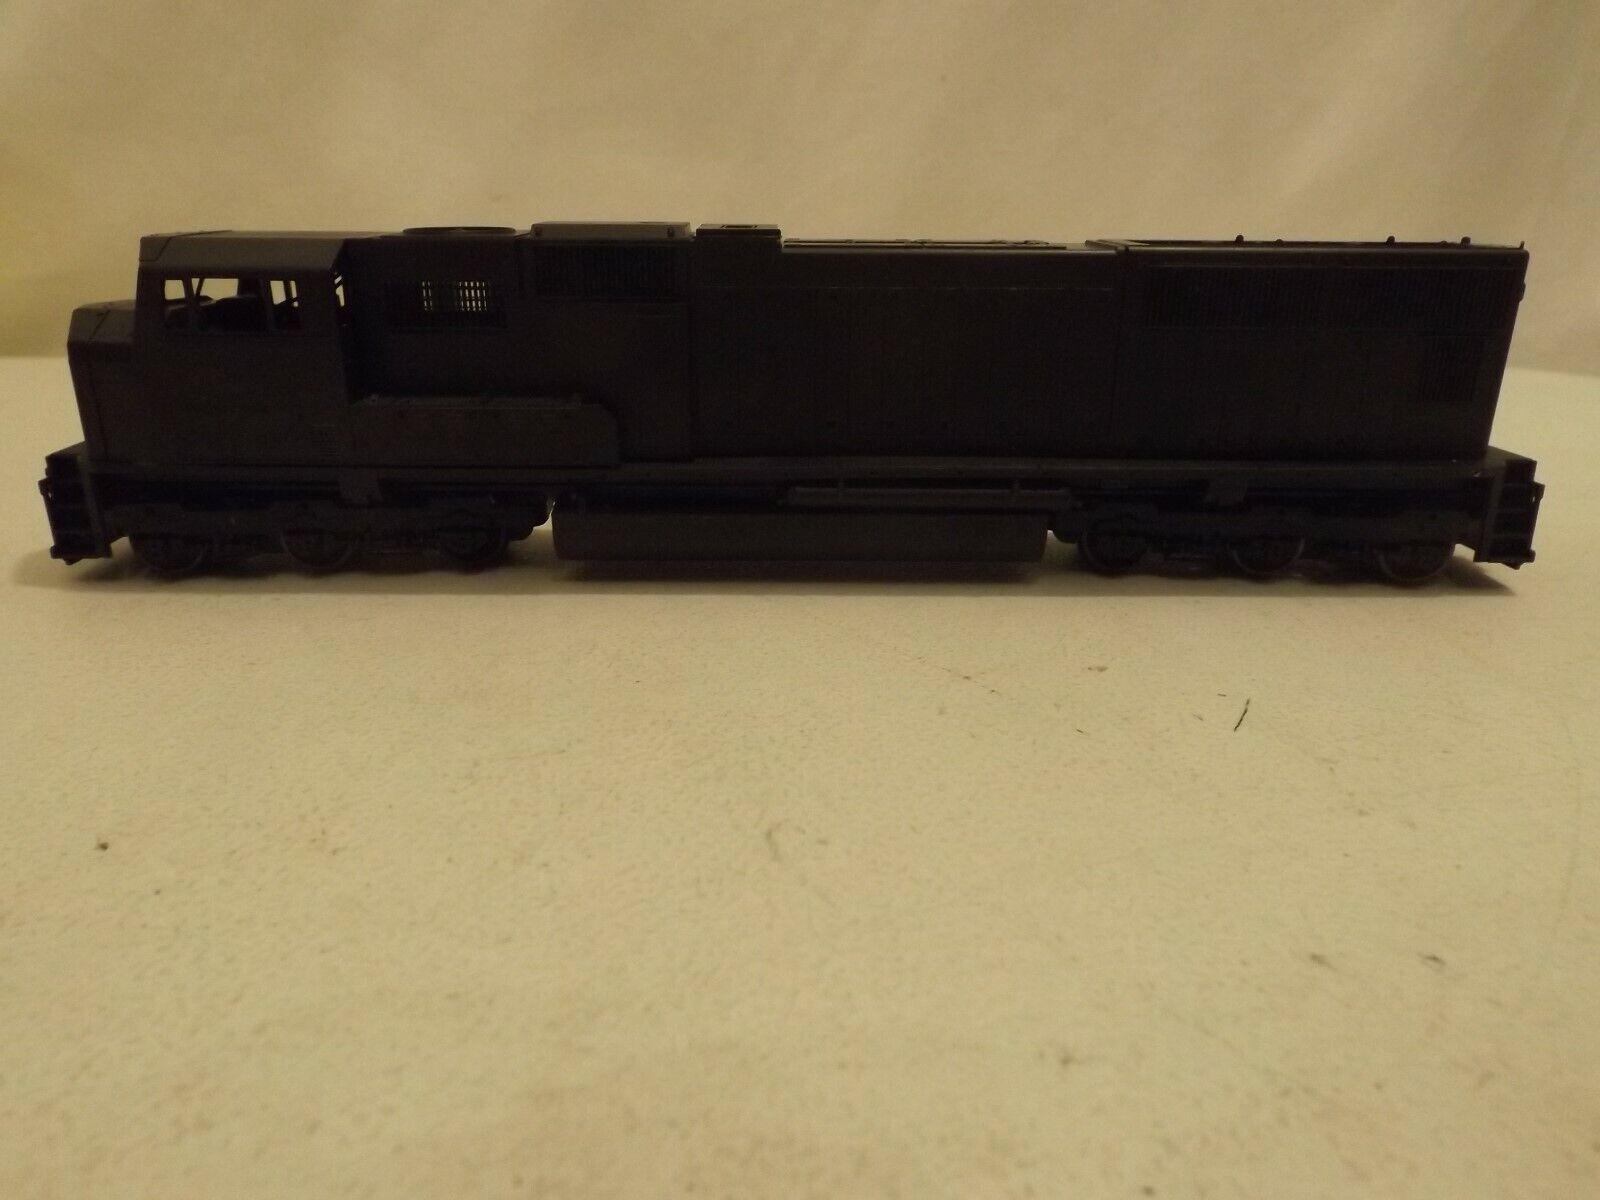 HO Genesis SD70 I motore diesel, cabina canadese, NIB